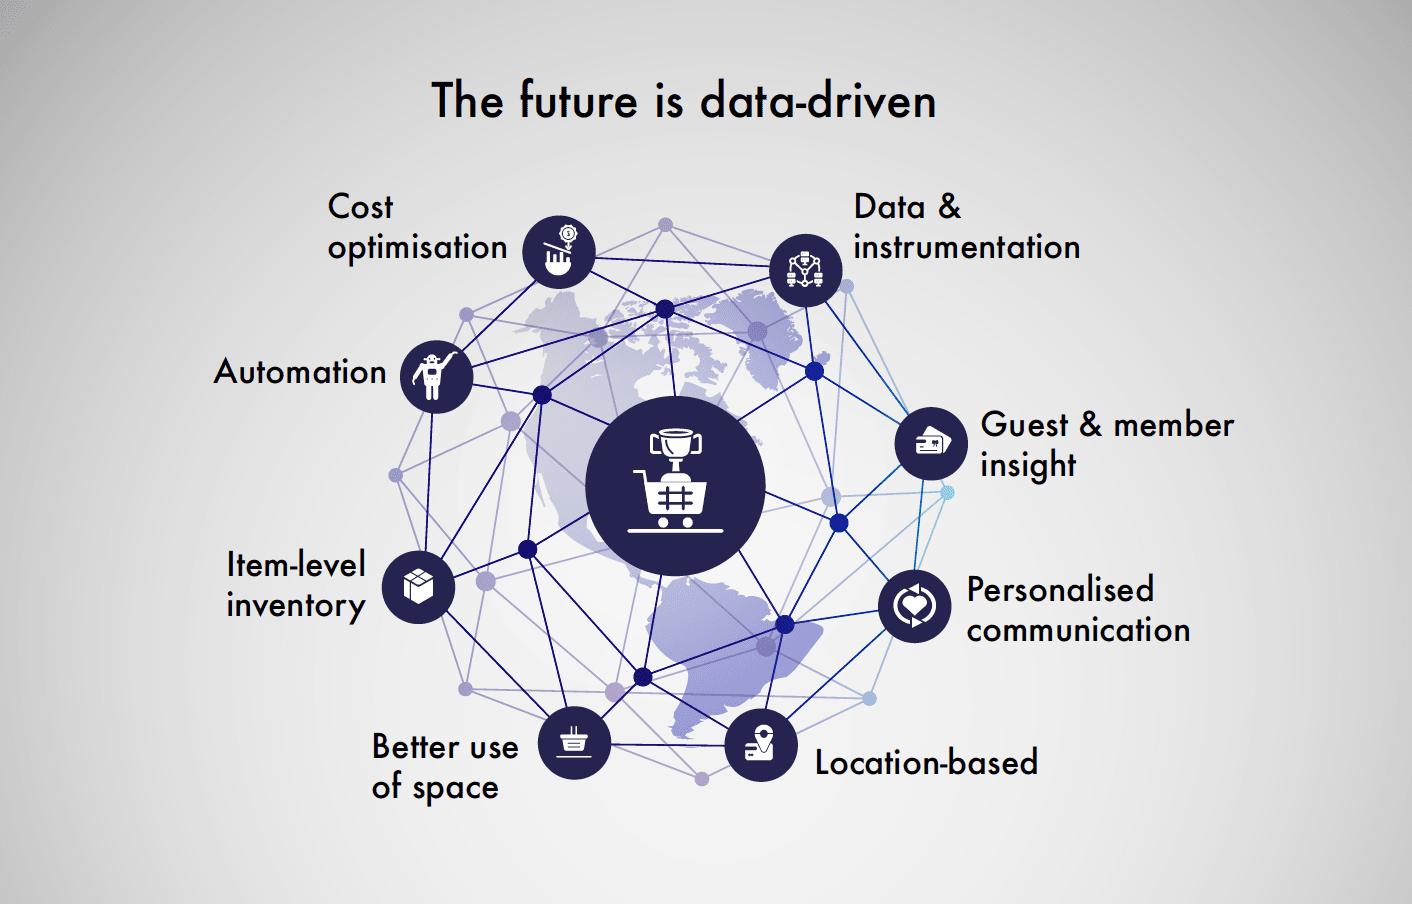 The future is data-driven